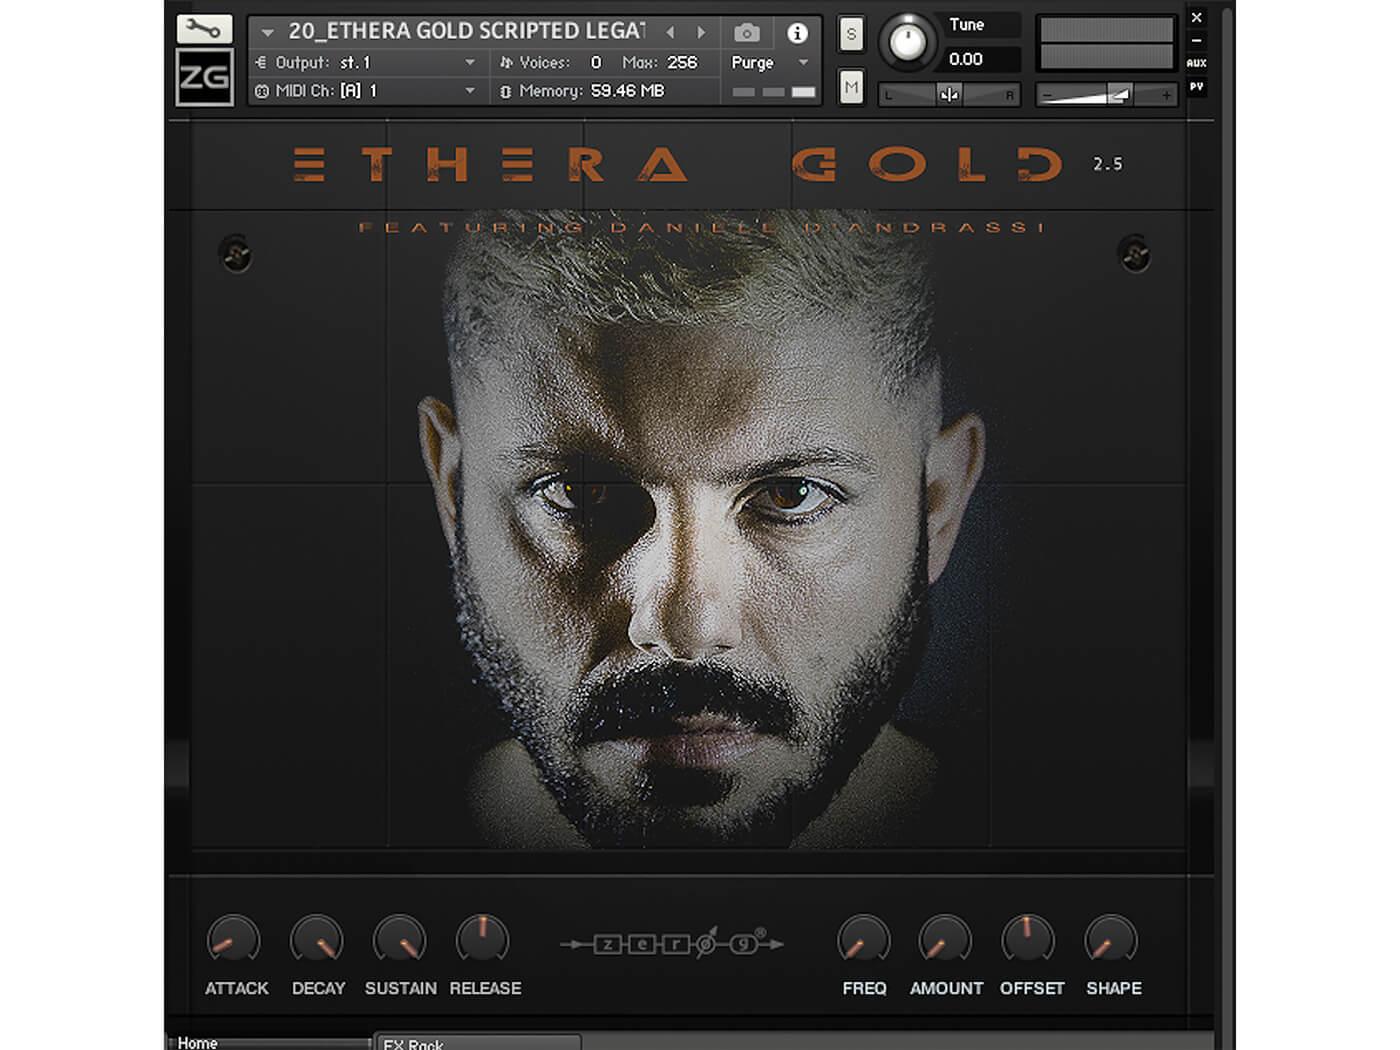 Zero-G Ethera Gold 2.5